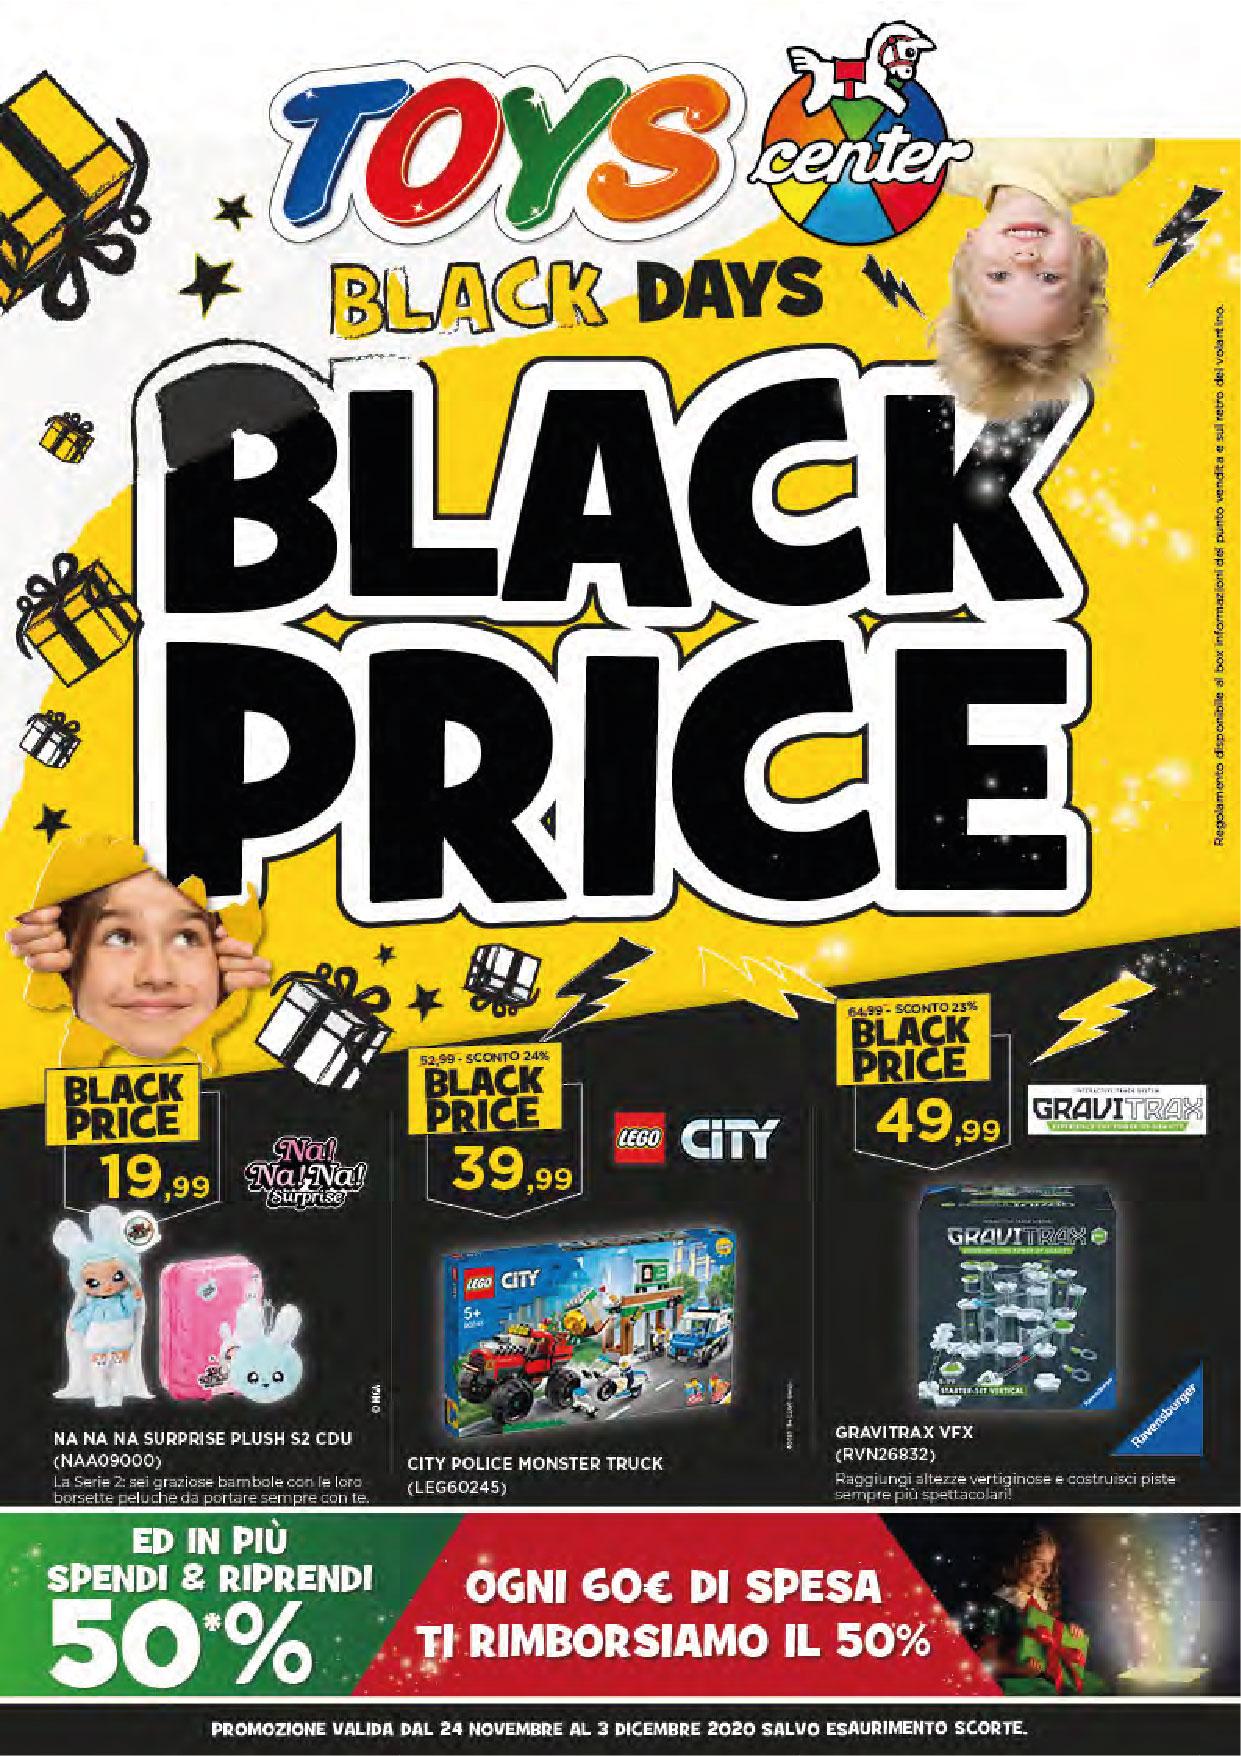 Toys Center: Black Days, Black Price!